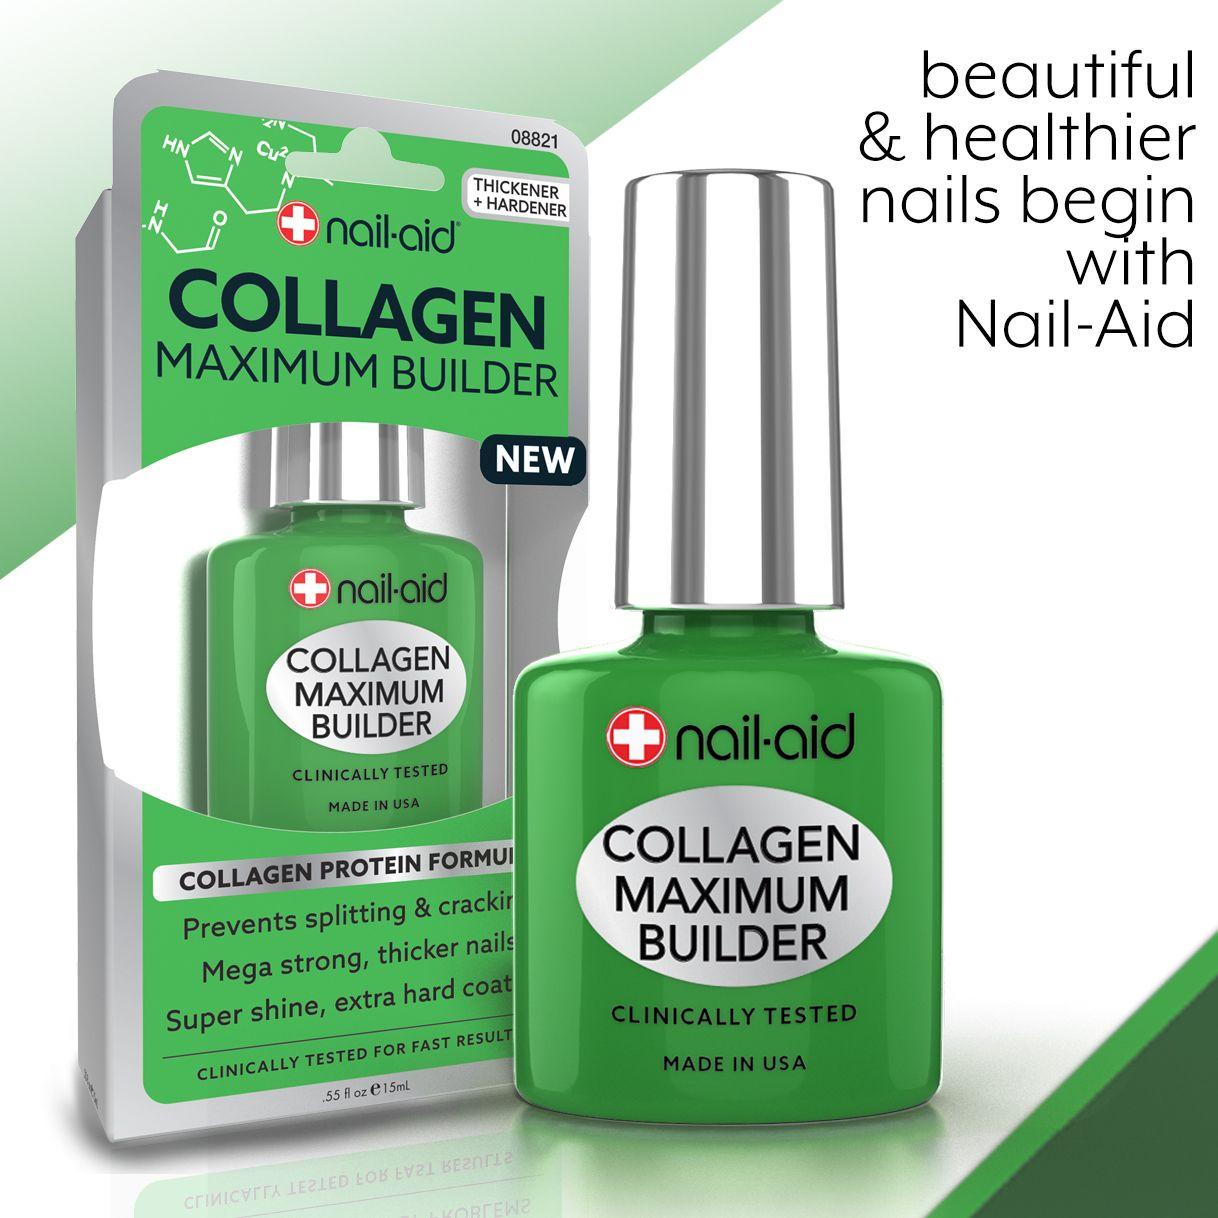 COLLAGEN MAXIMUM BUILDER An intensive high-protein treatment that ...